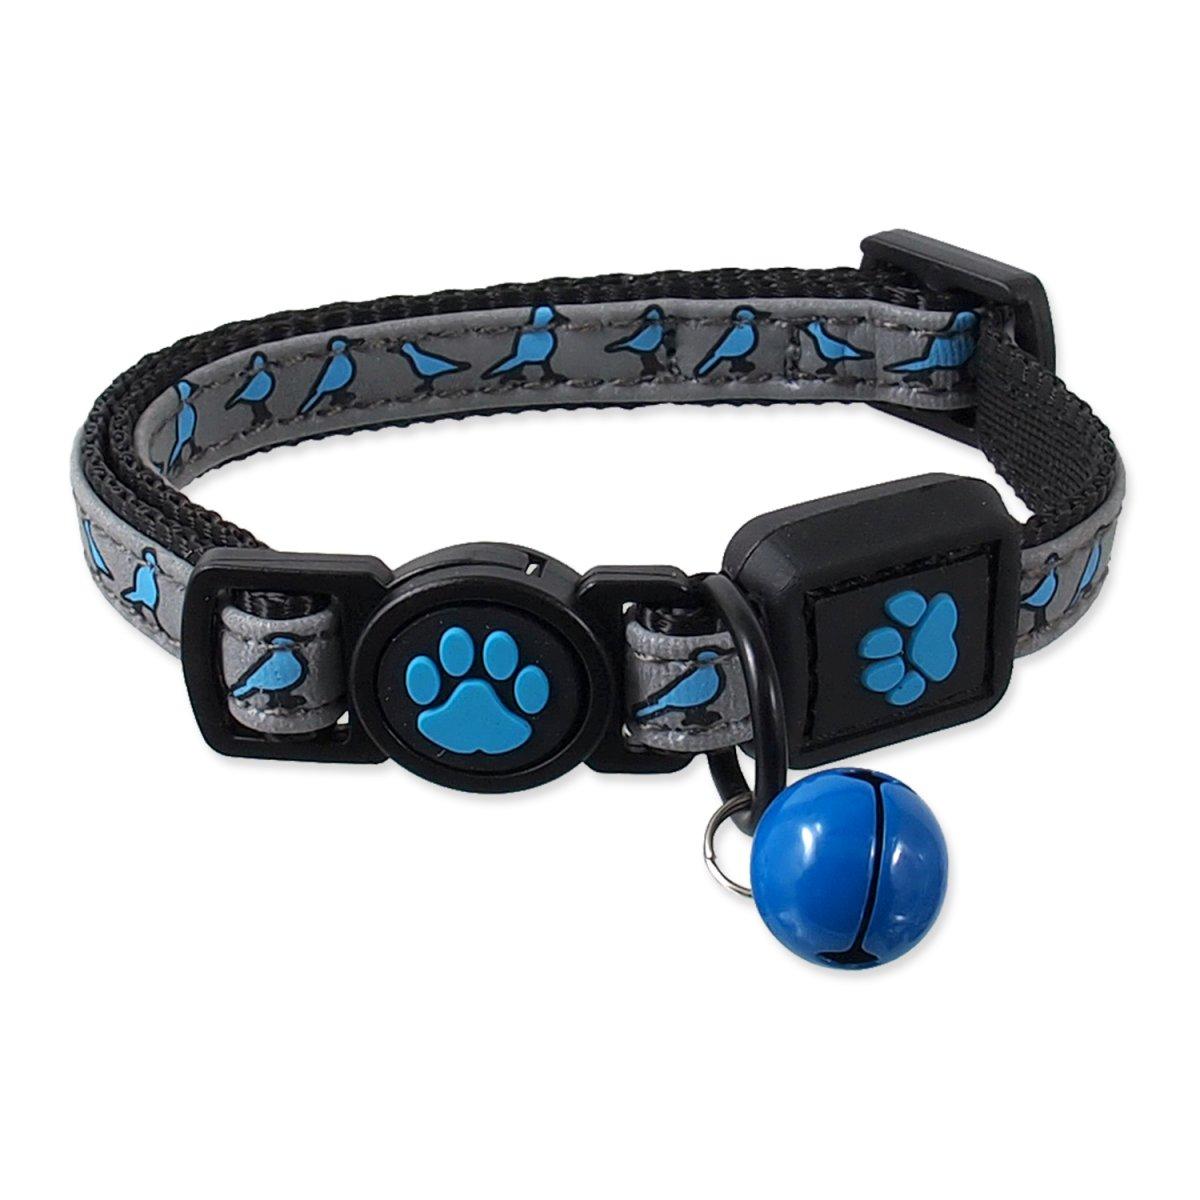 Obojek ACTIVE CAT Reflective modrý XXS (1ks)